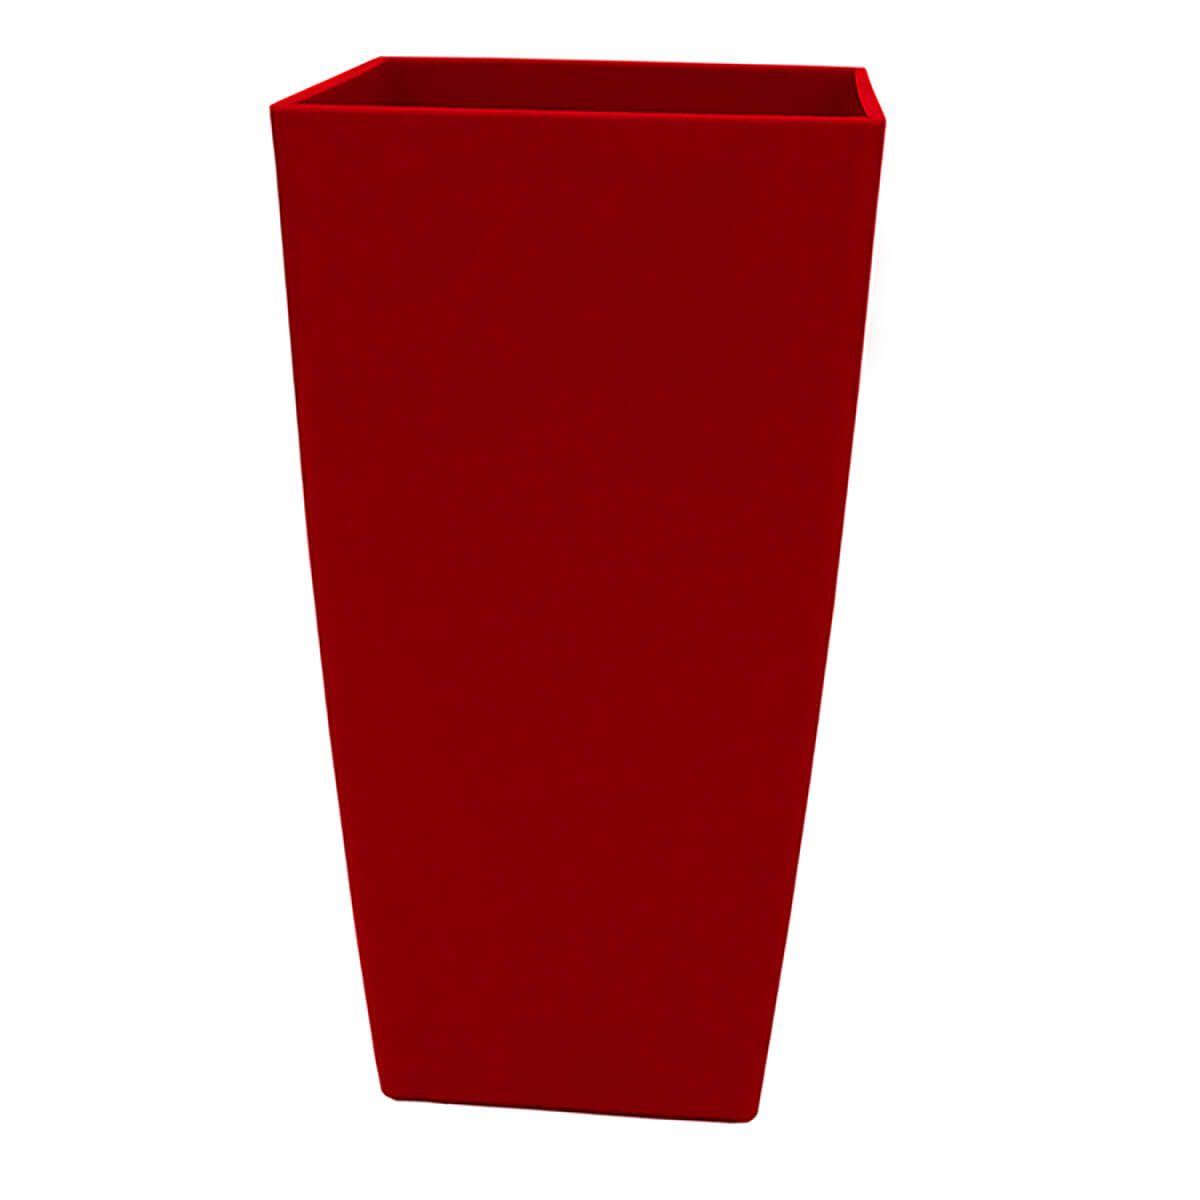 Vaso Piza 22 x 40 cm Vermelho Vasart